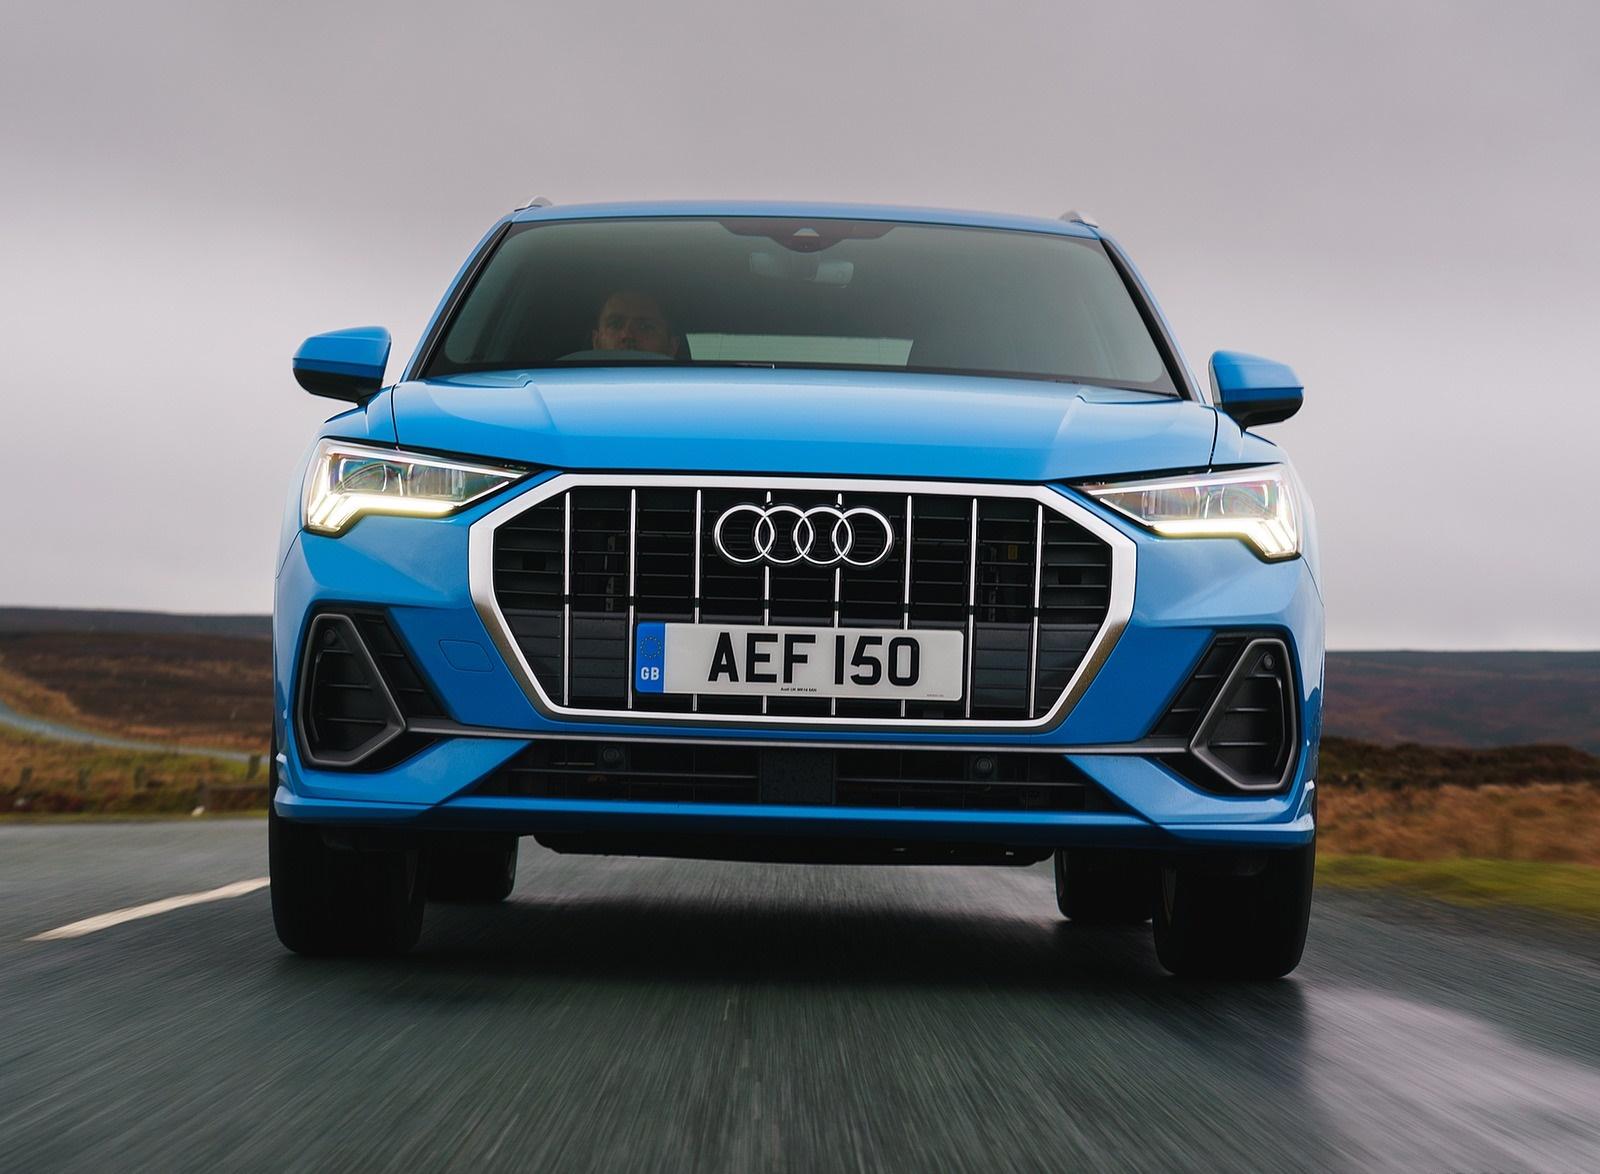 2019 Audi Q3 35 Tfsi Uk Spec Front Wallpaper 40 Hd Wallpapers